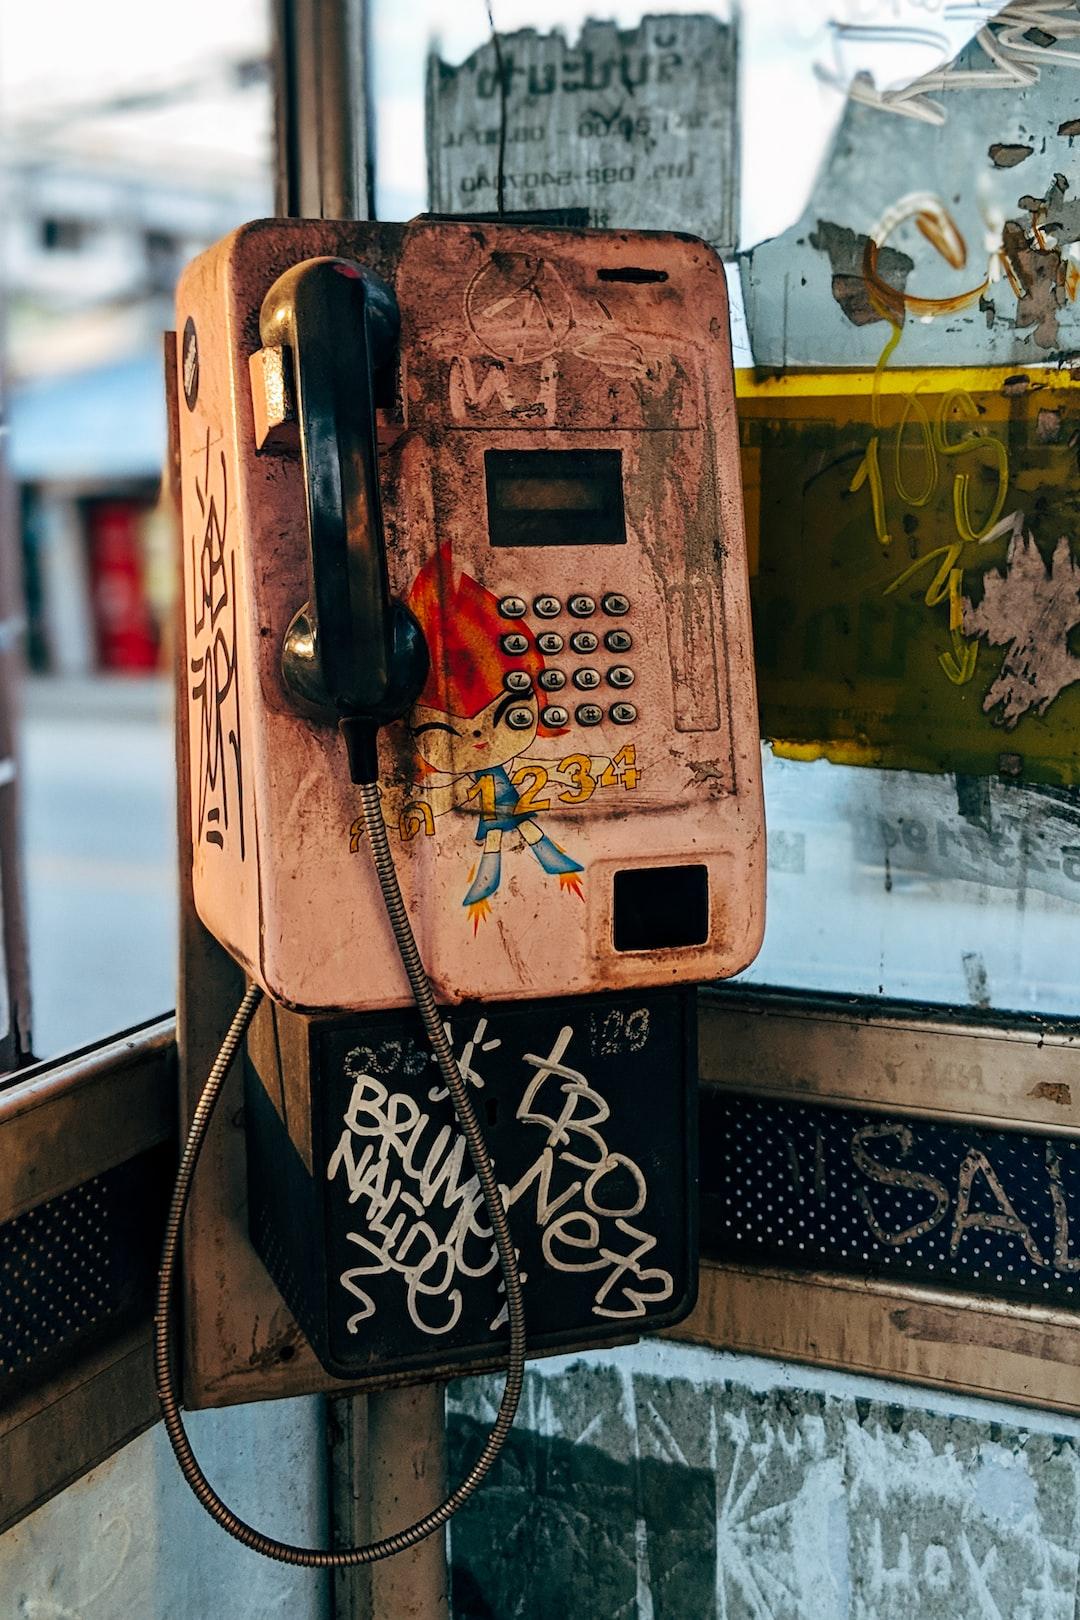 Beat-up public phone in Thailand